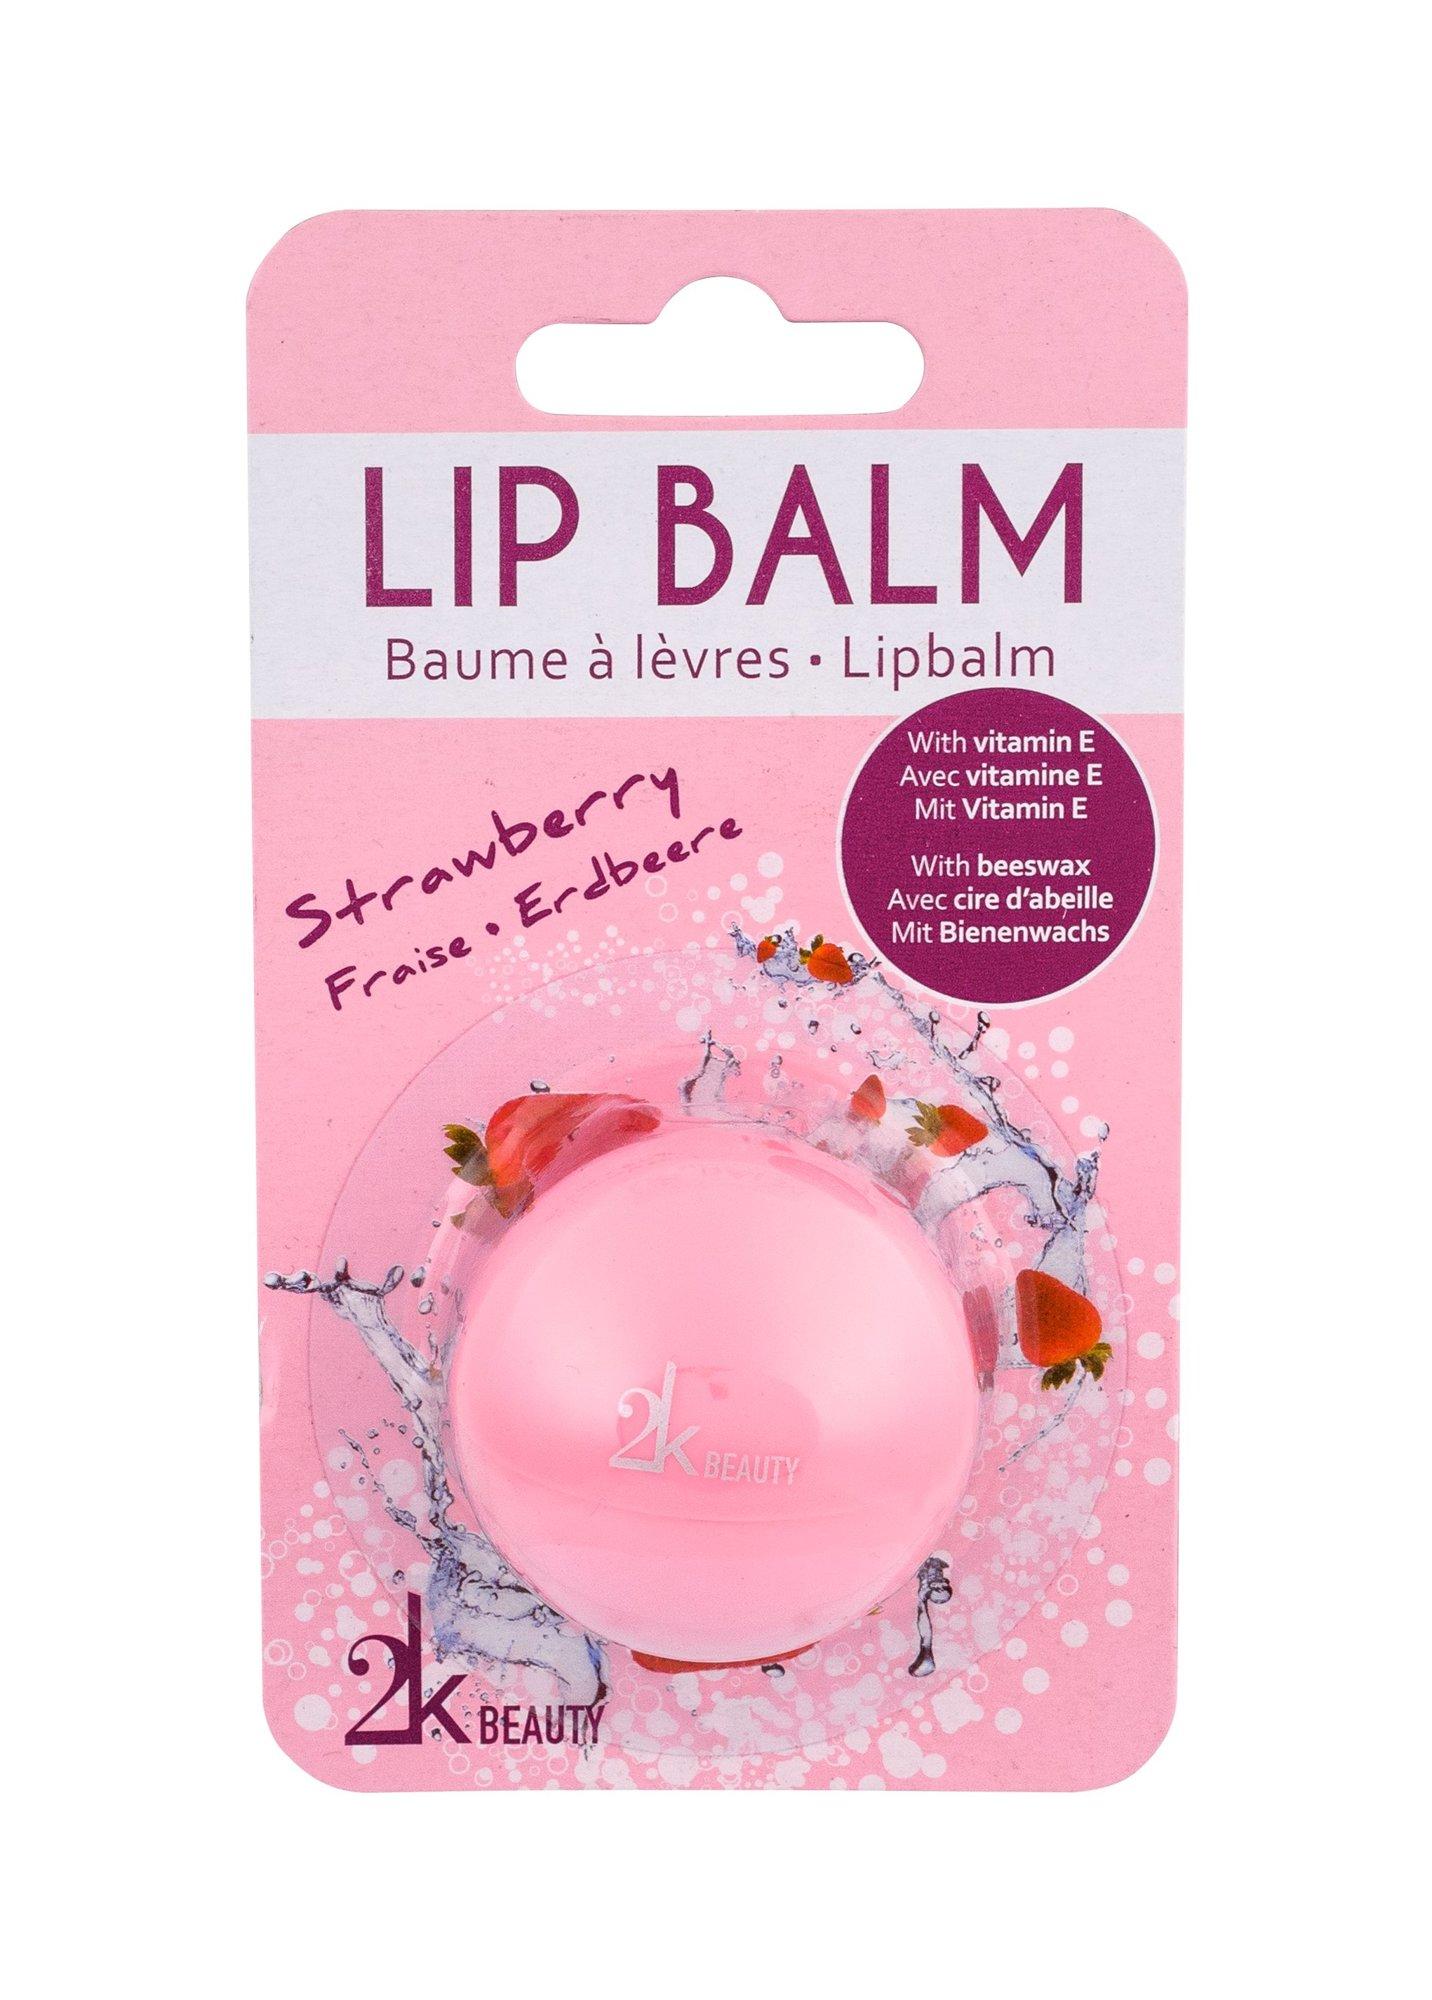 2K Beauty Lip Balm 5ml Strawberry